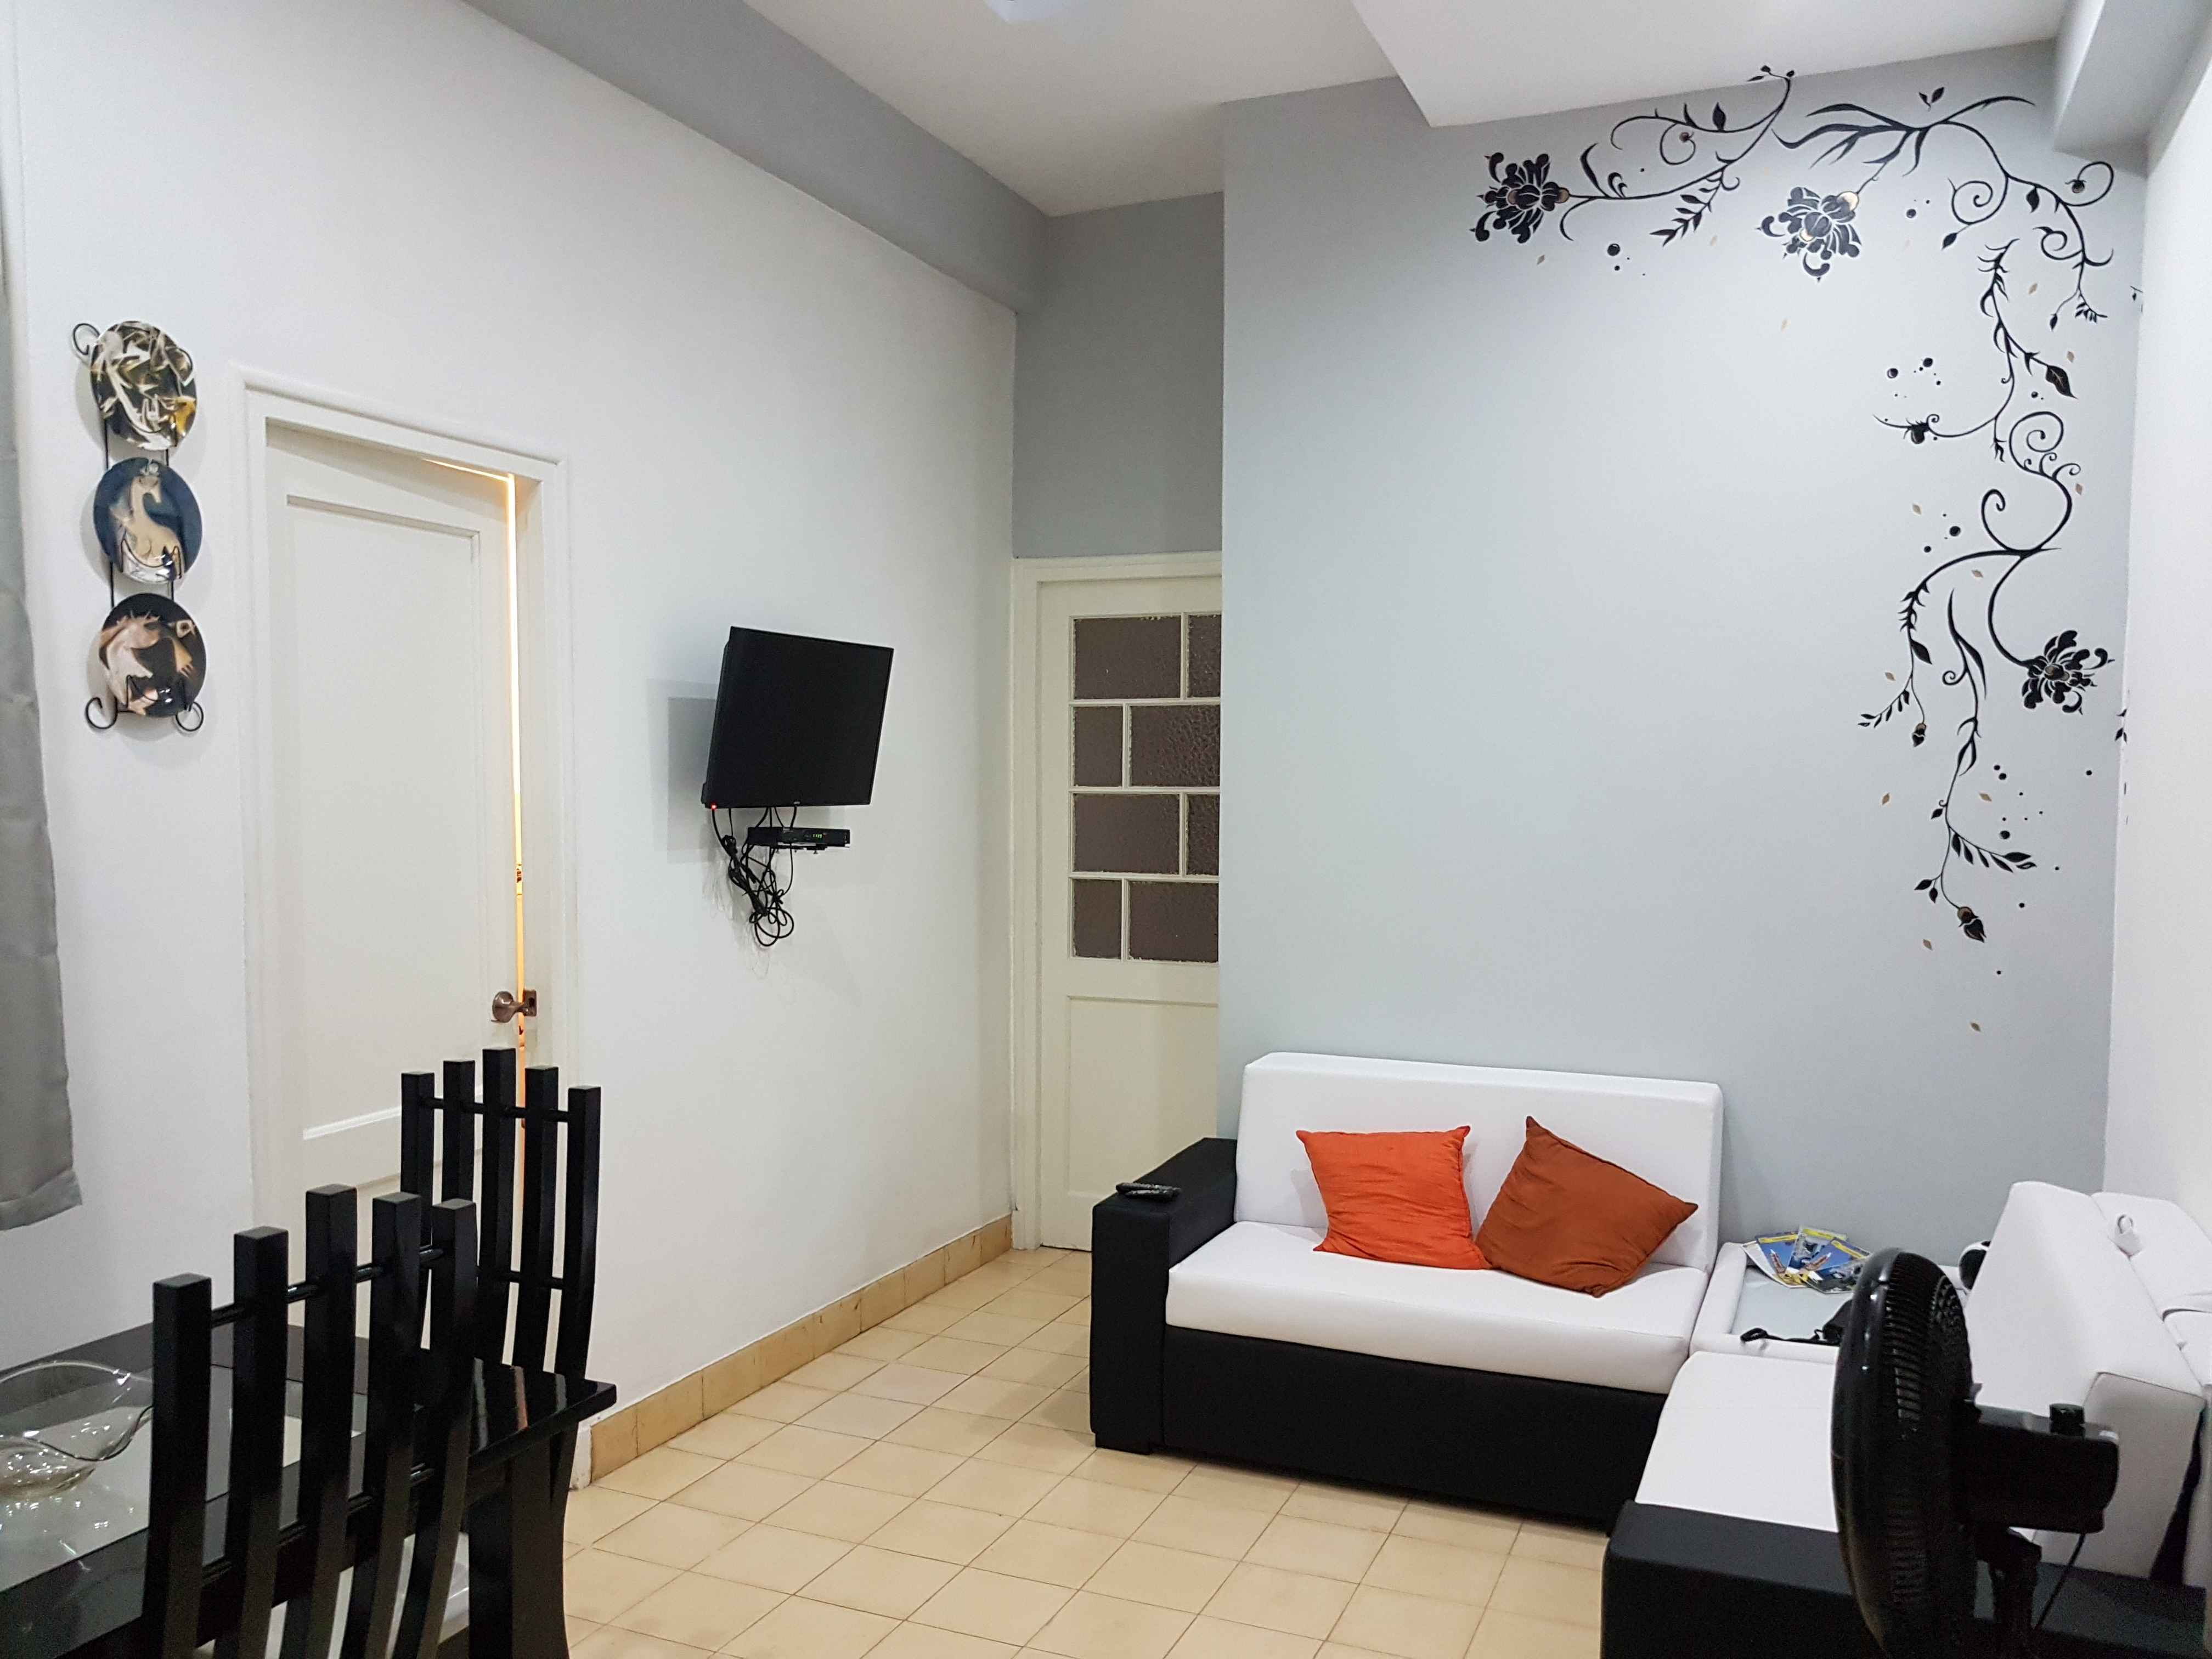 HAV142 - Suite Villegas